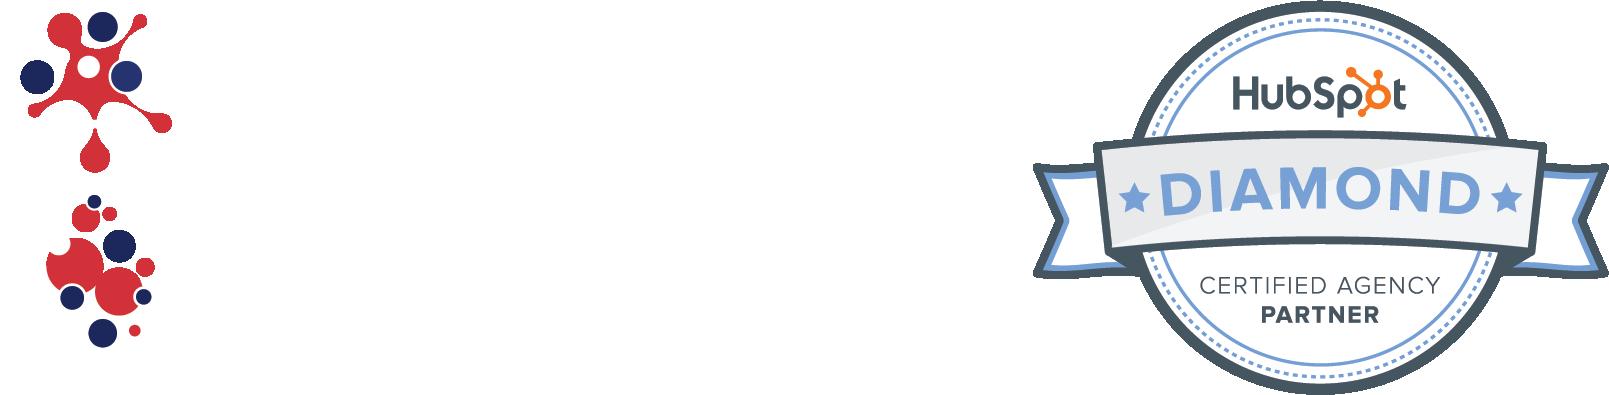 The only UK Diamond HubSpot Partner